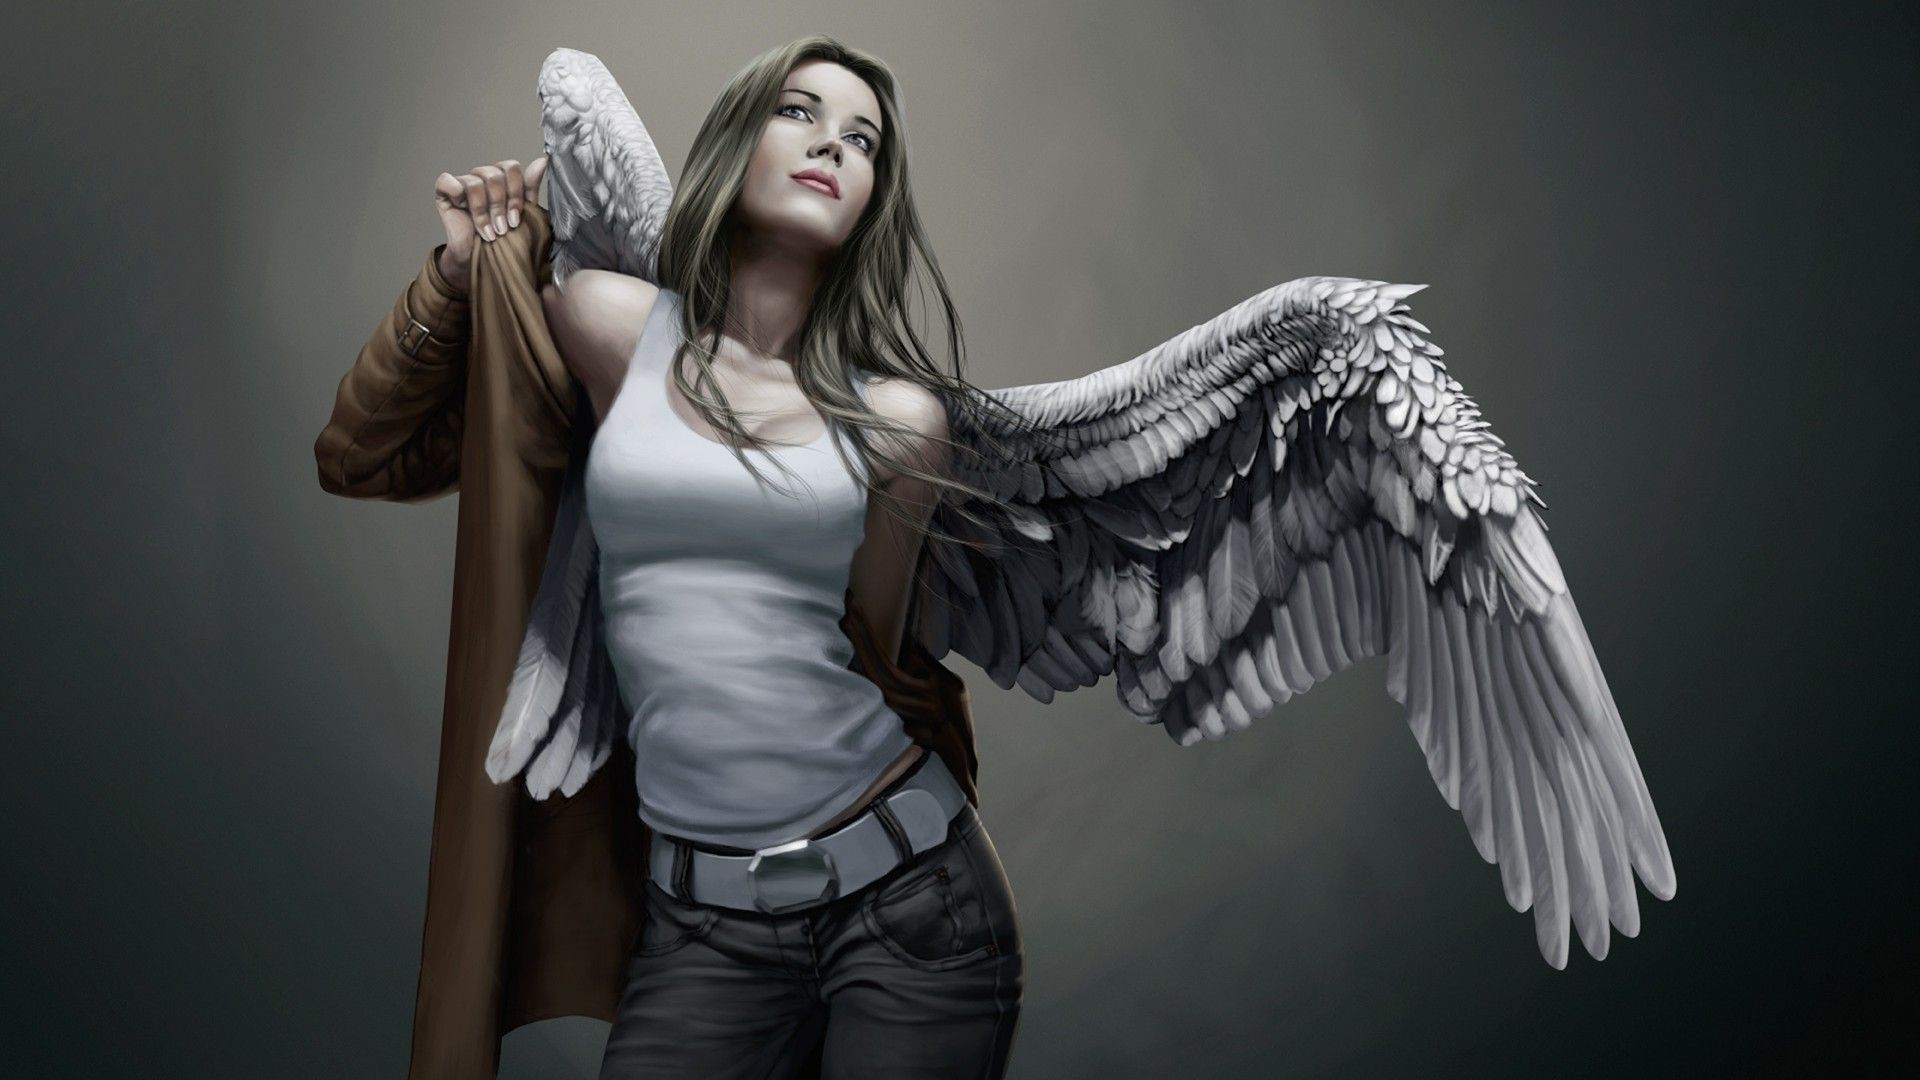 Wallpaper Desktop Girls Angels